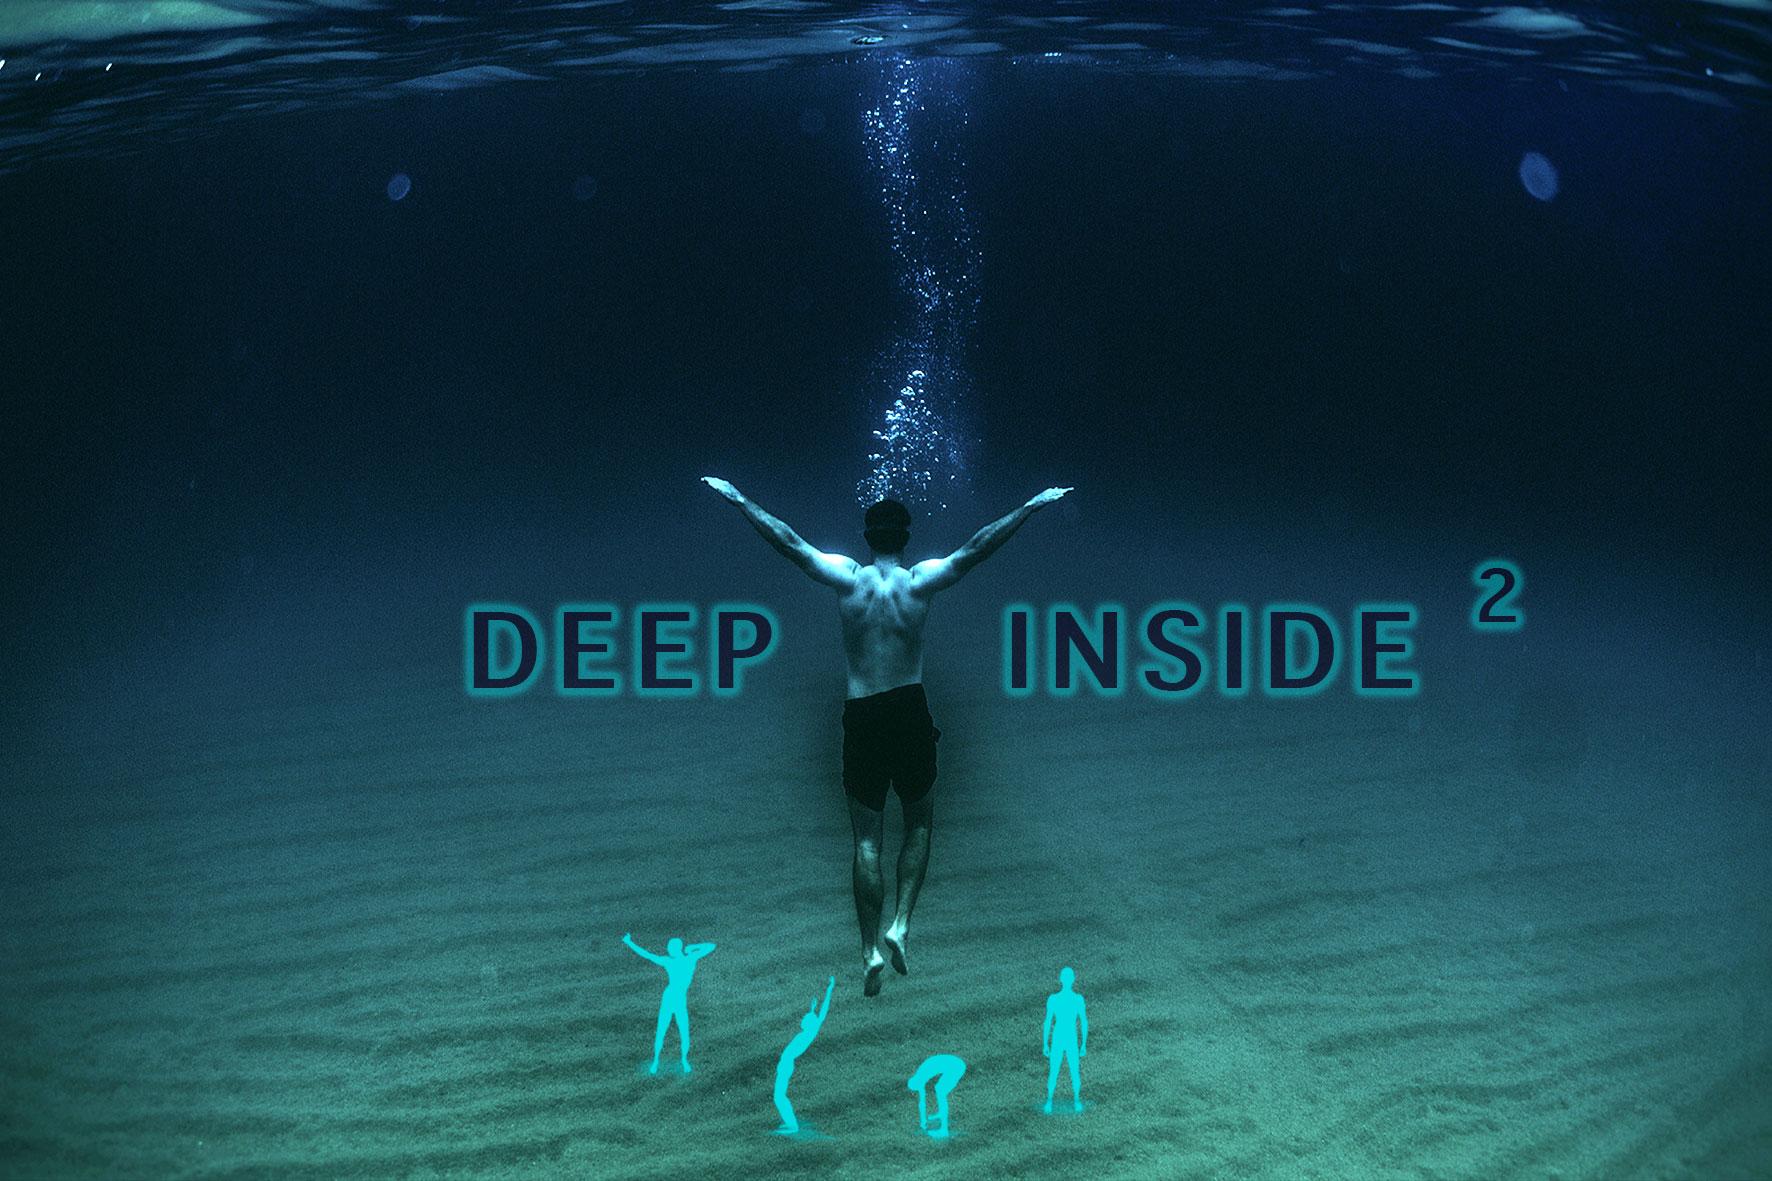 Deep_Inside_2_Pratica-bioenergetica